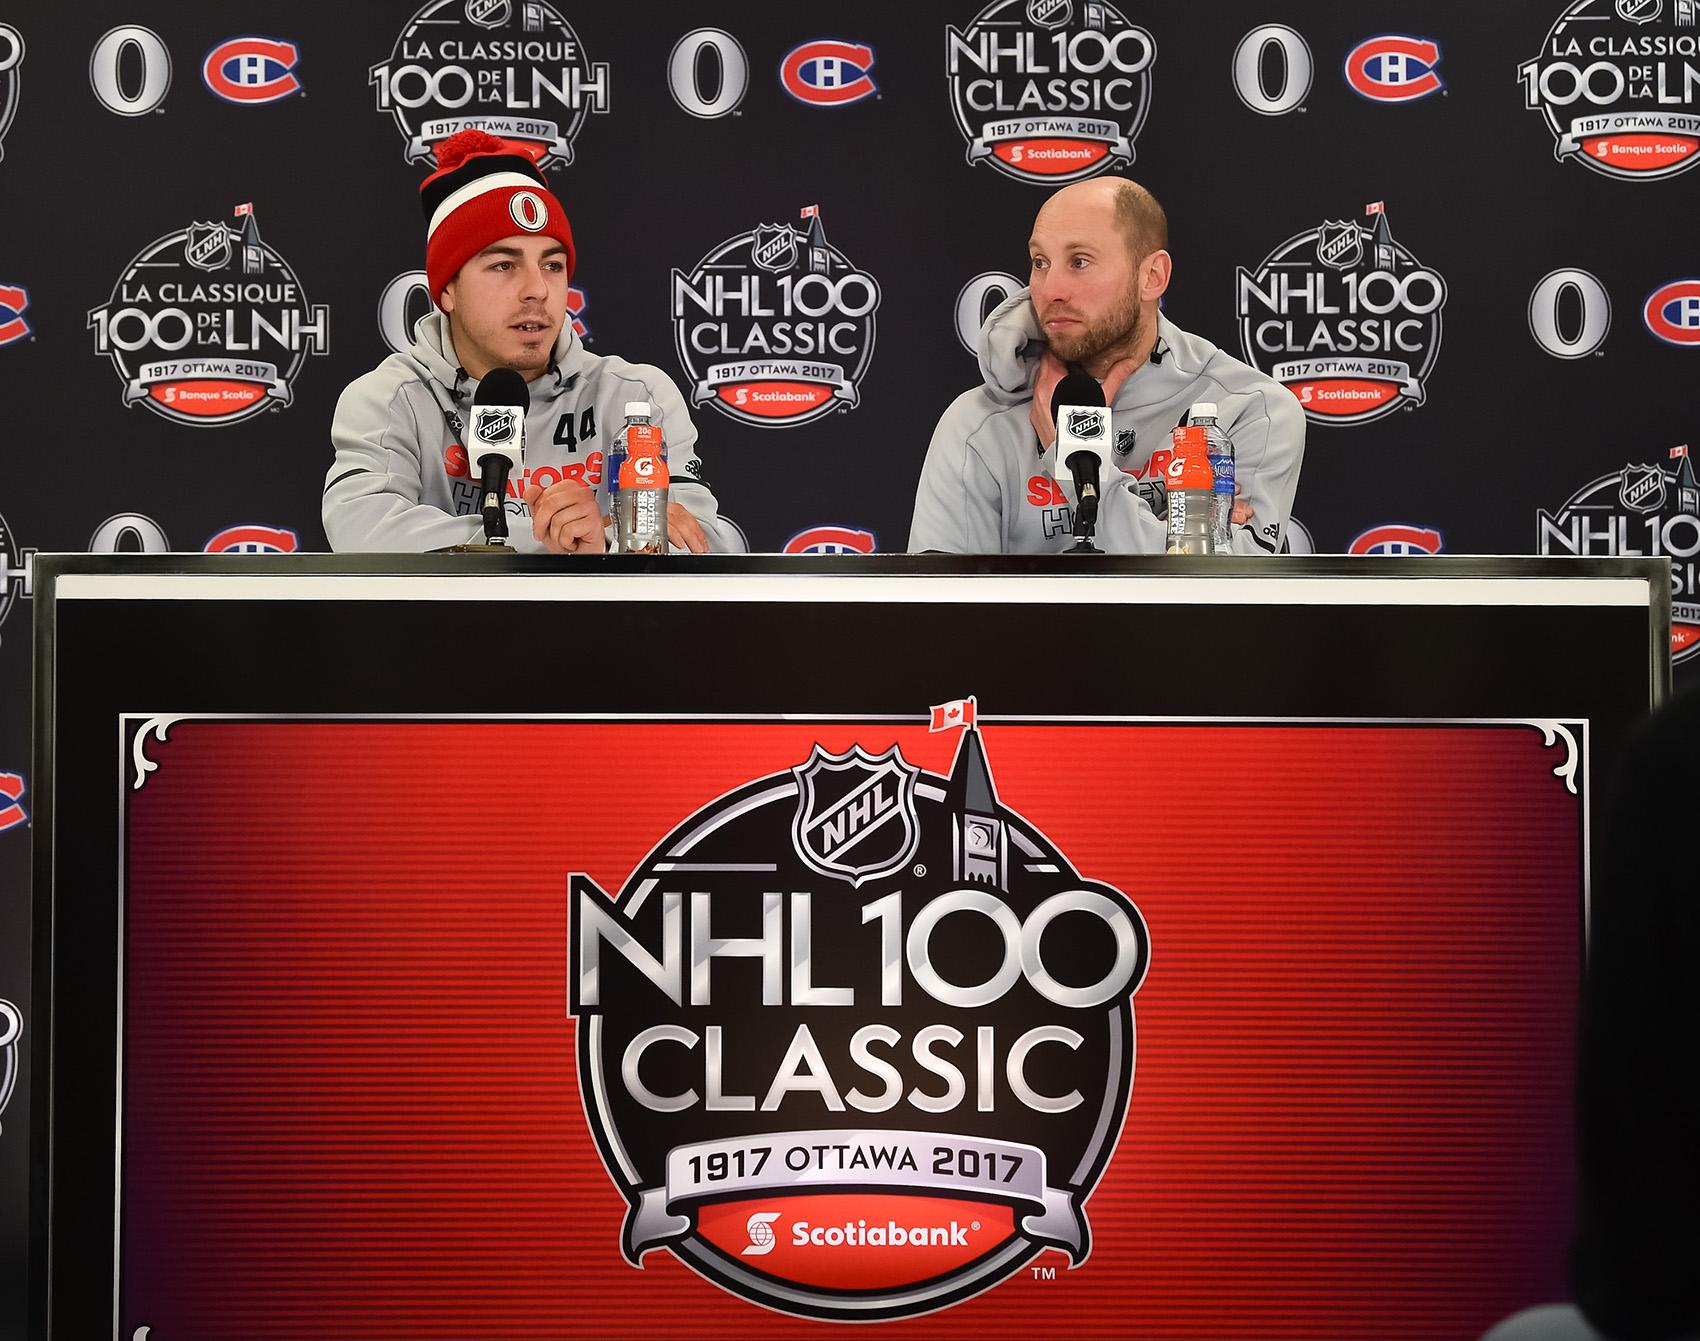 Ottawa_NHL100_Design_7.jpg